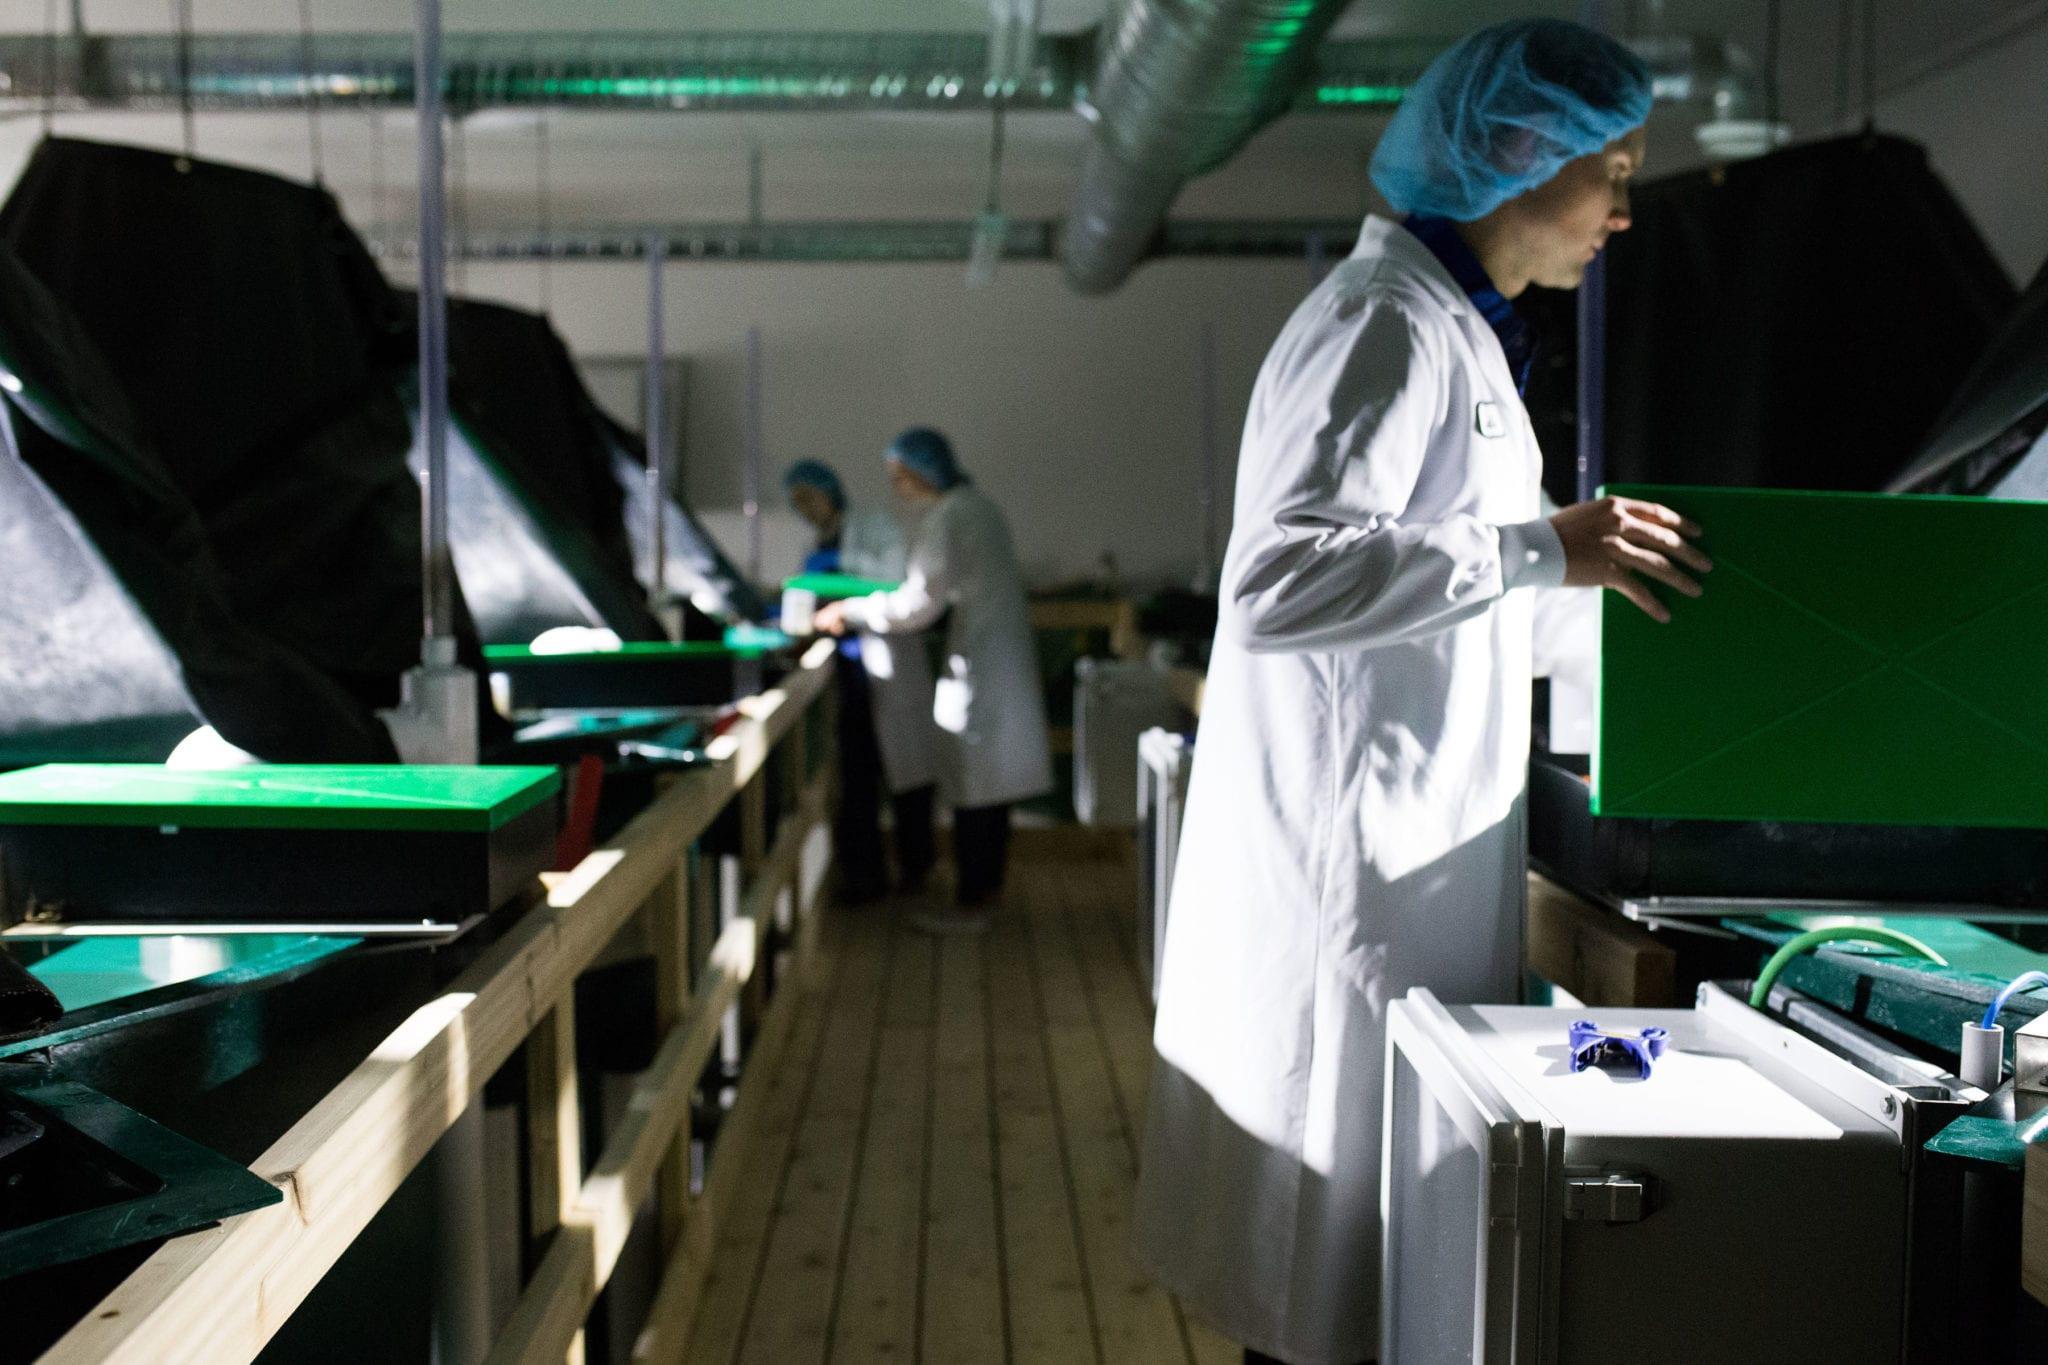 aquaponics cannabis and coho salmon production at Habitat Craft Cannabis